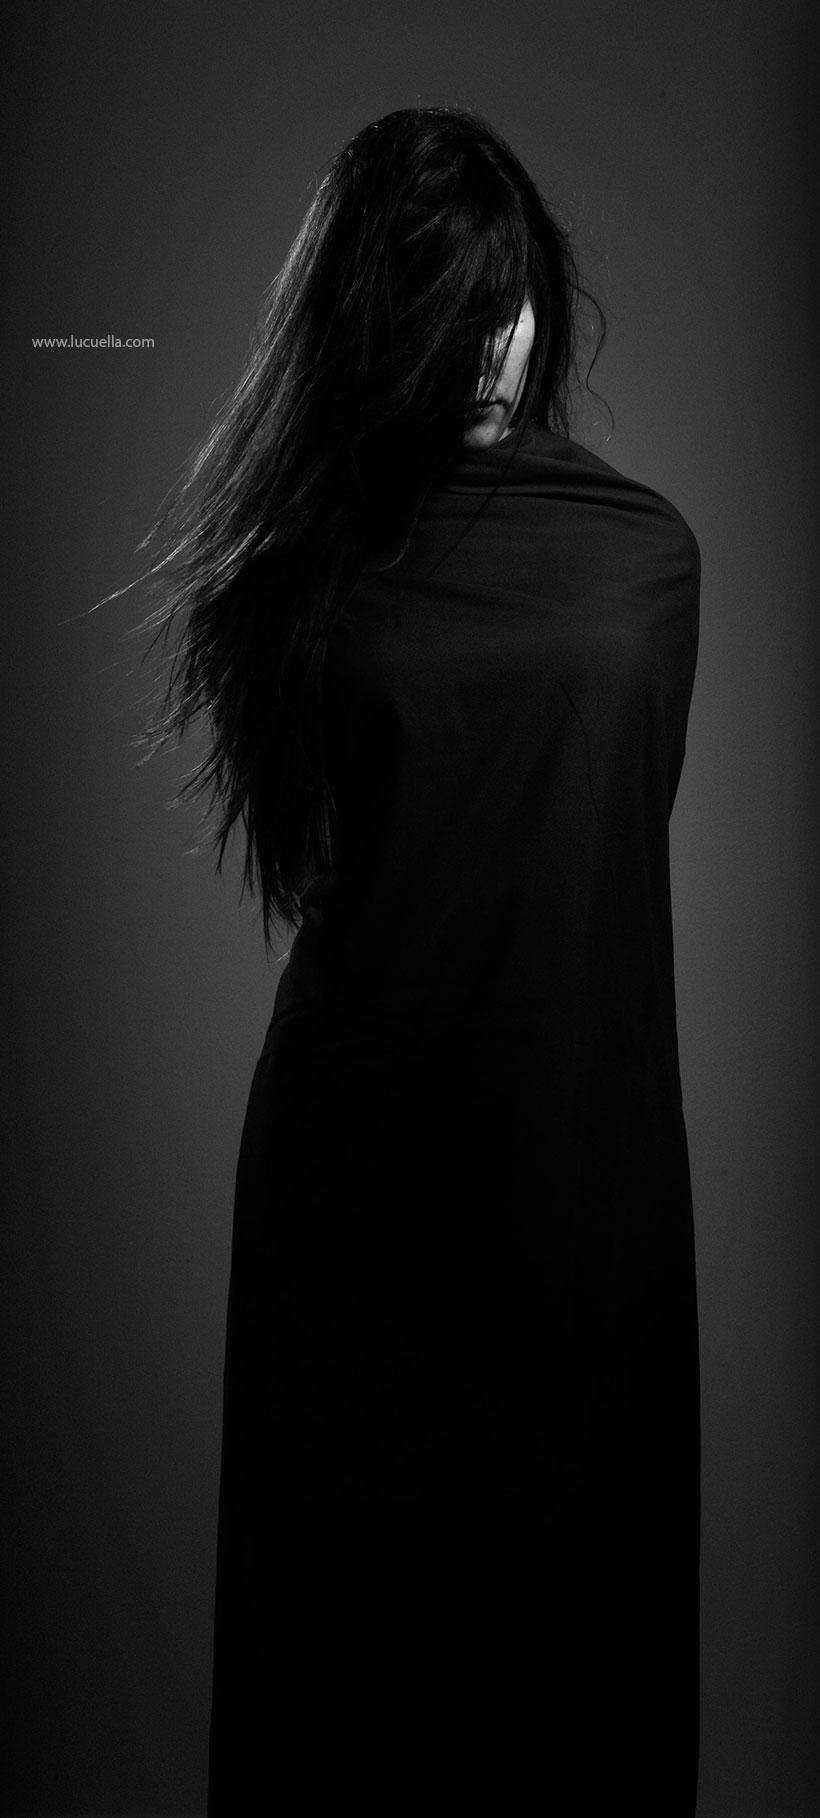 fotografia-artistica-lucuella